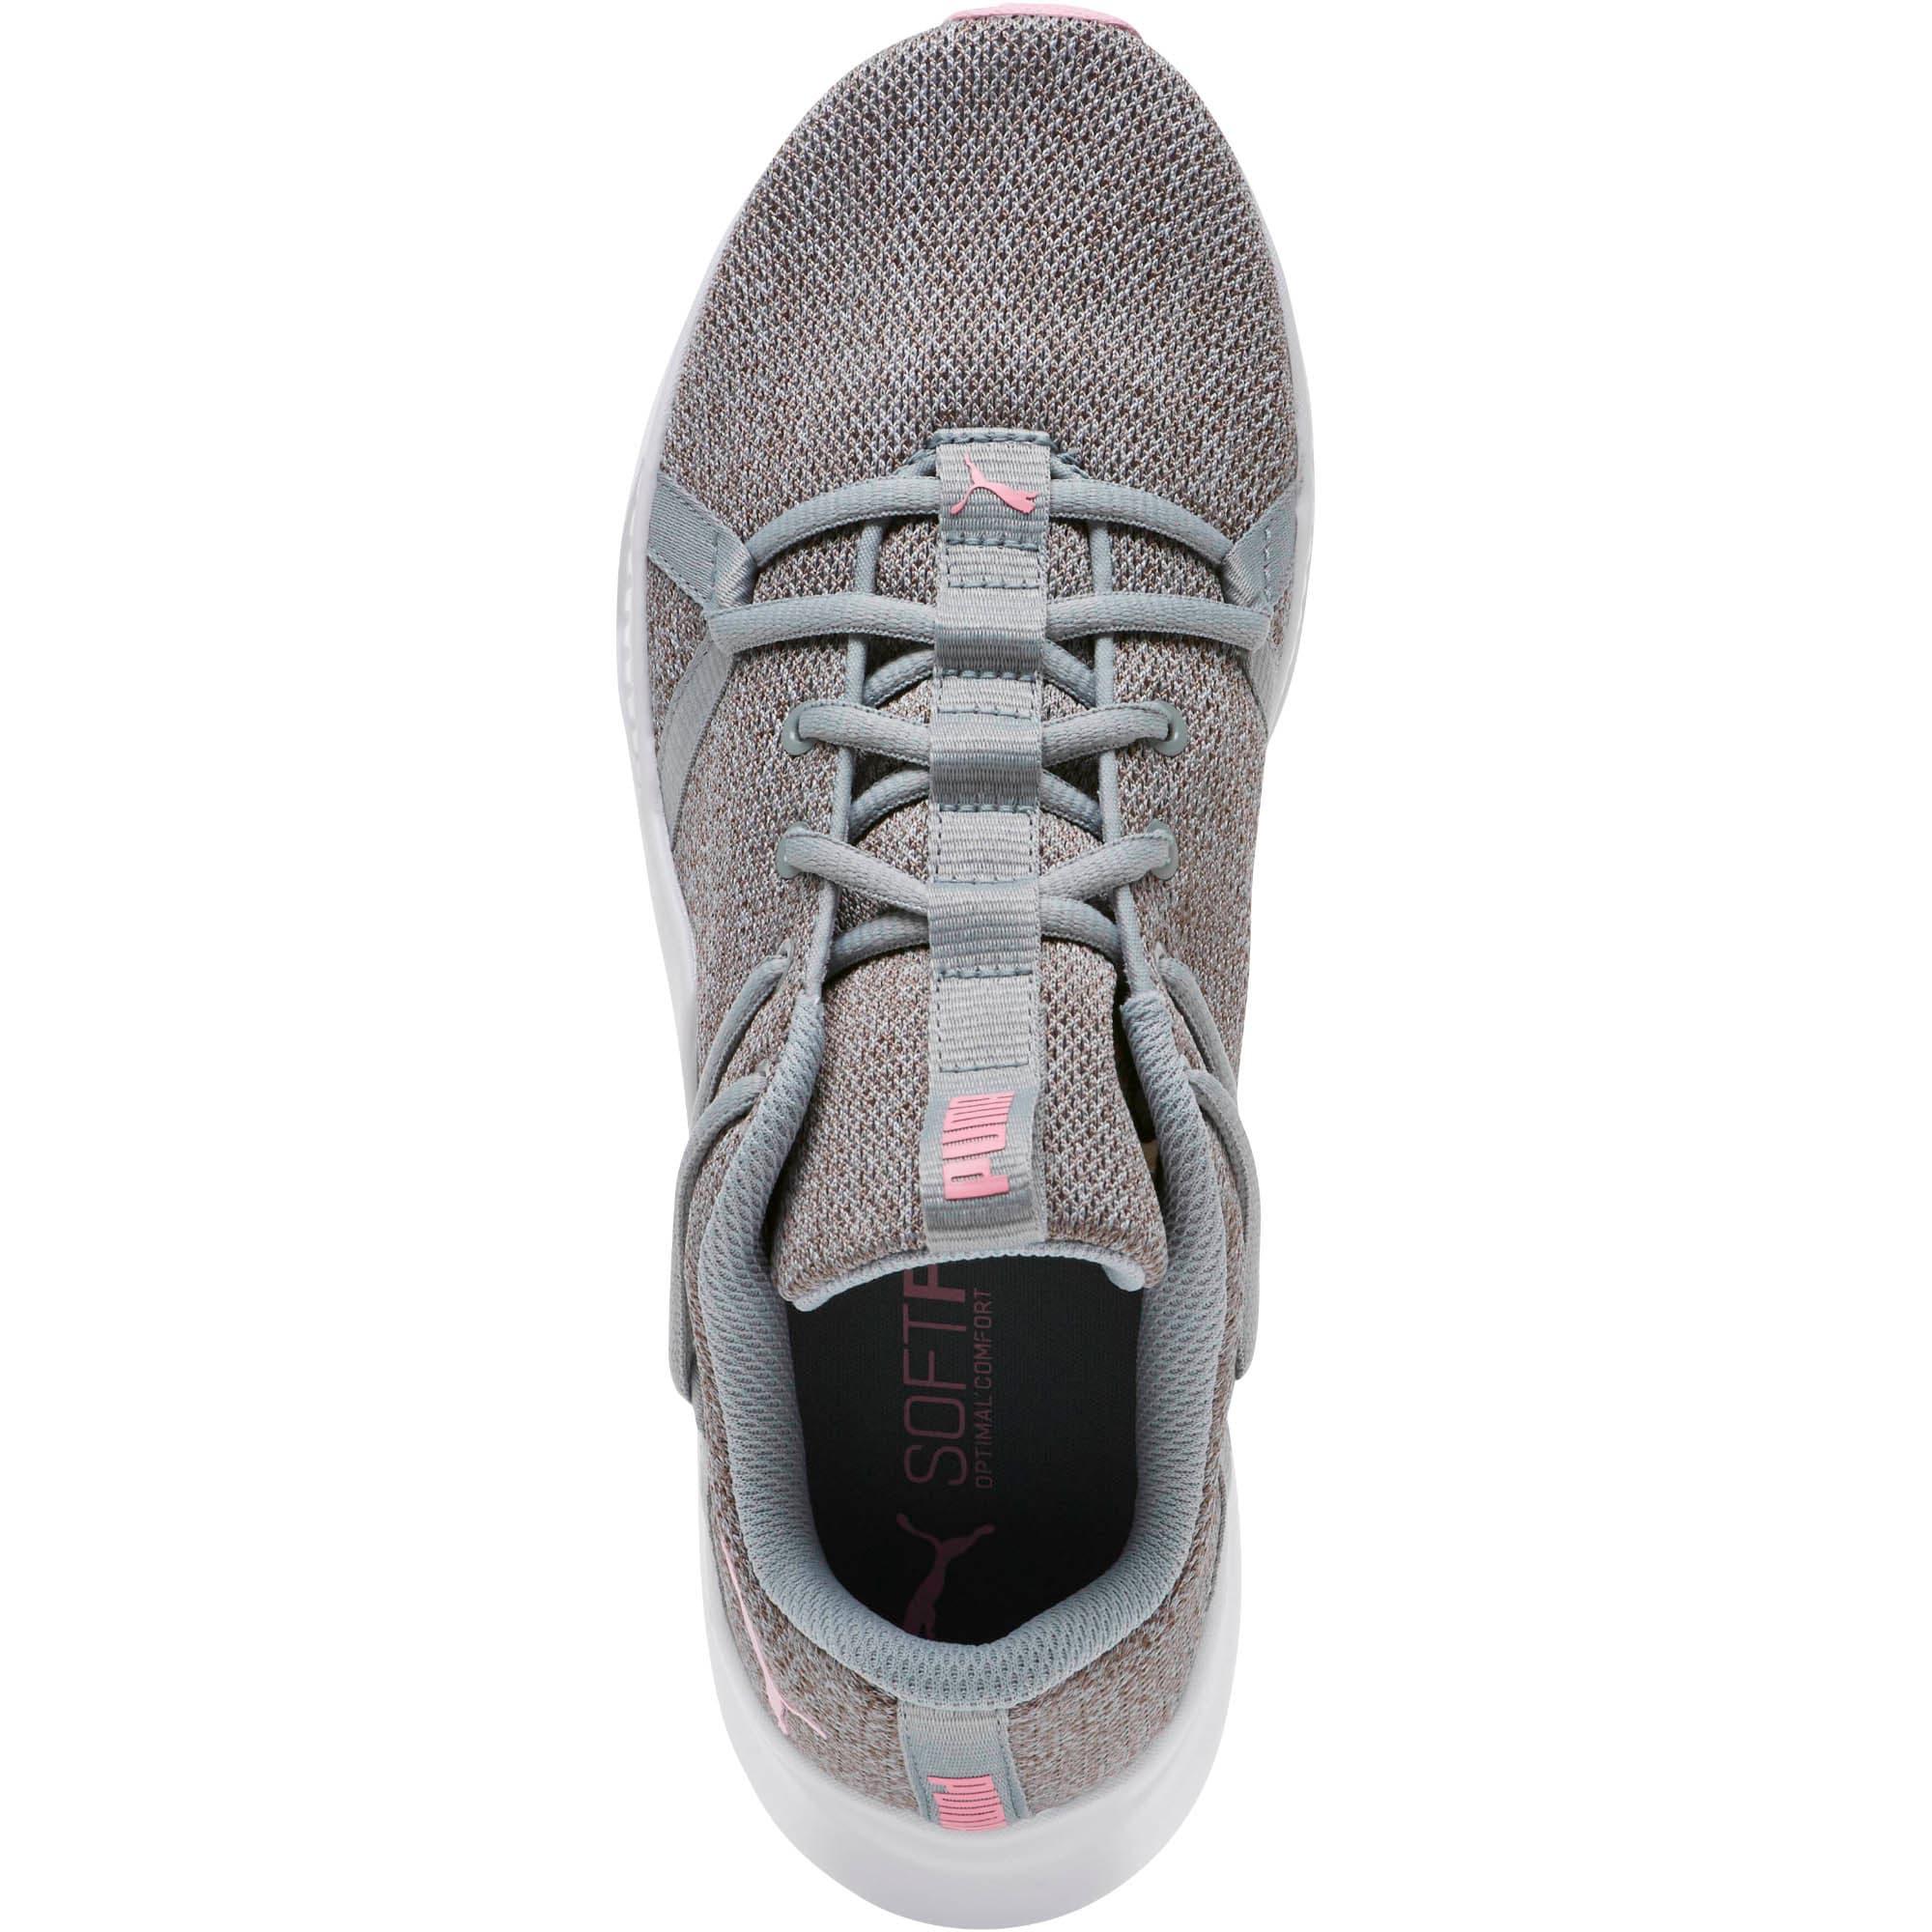 Thumbnail 5 of Incite Knit Women's Training Shoes, Quarry-Pale Pink, medium